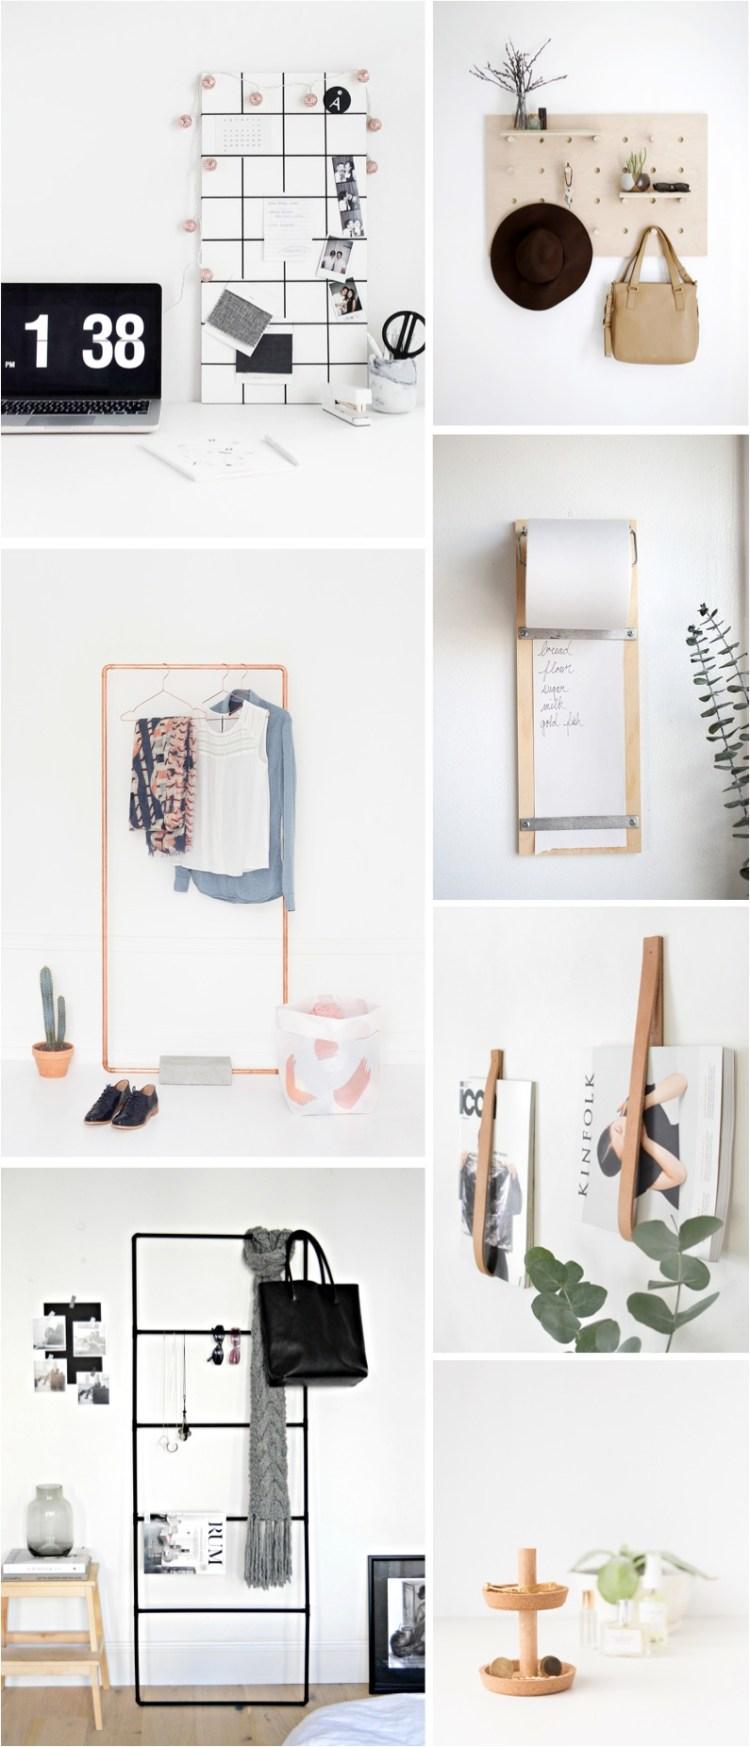 DIY home organisation ideas